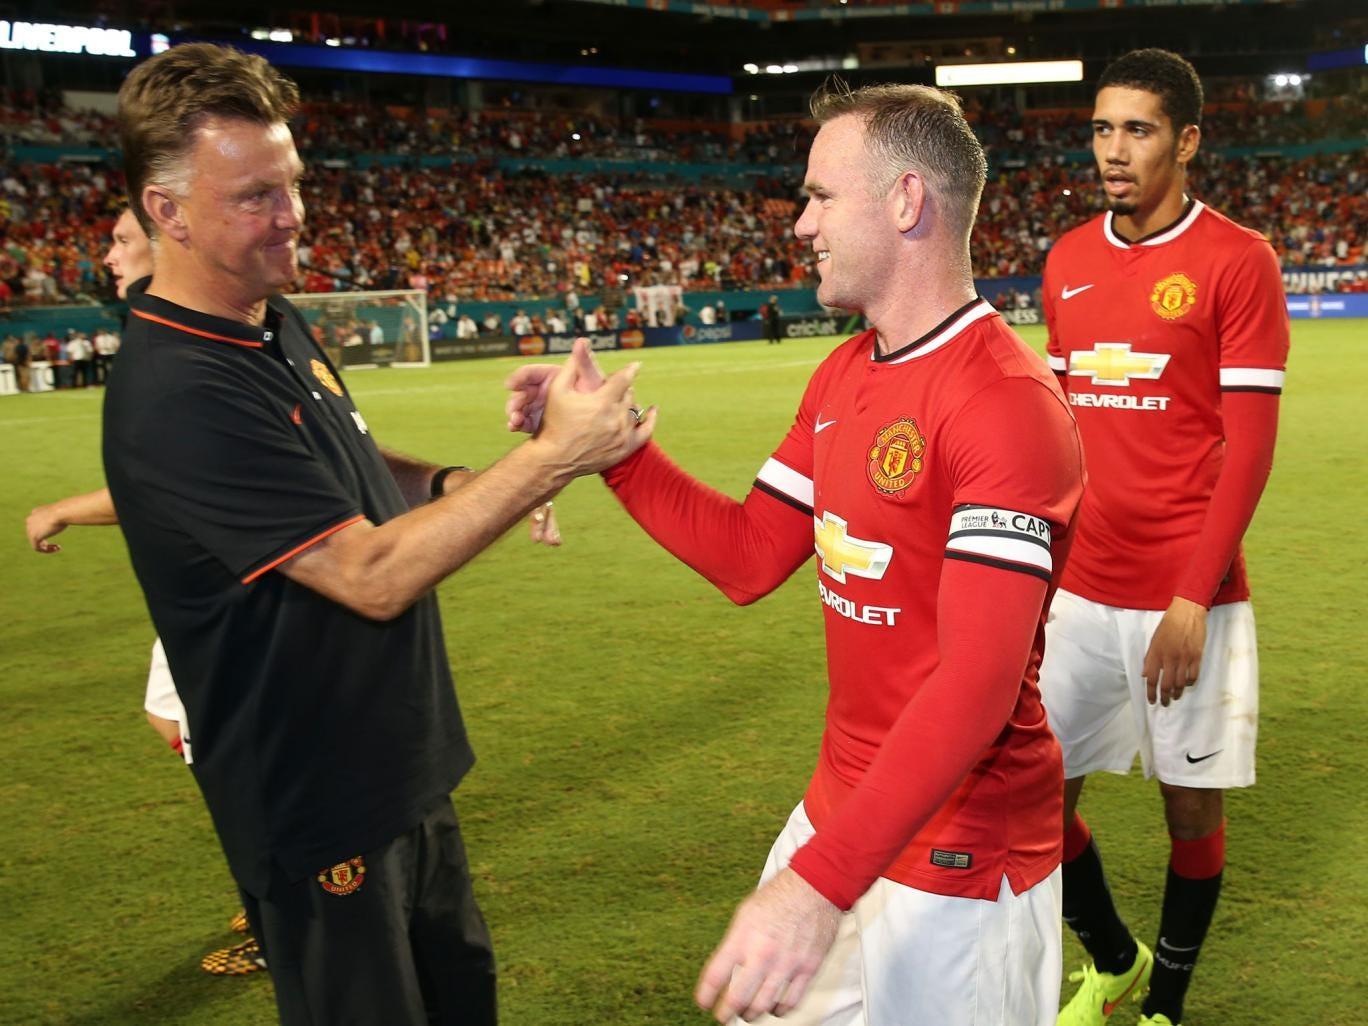 Louis van Gaal shakes Rooney's hand at full time